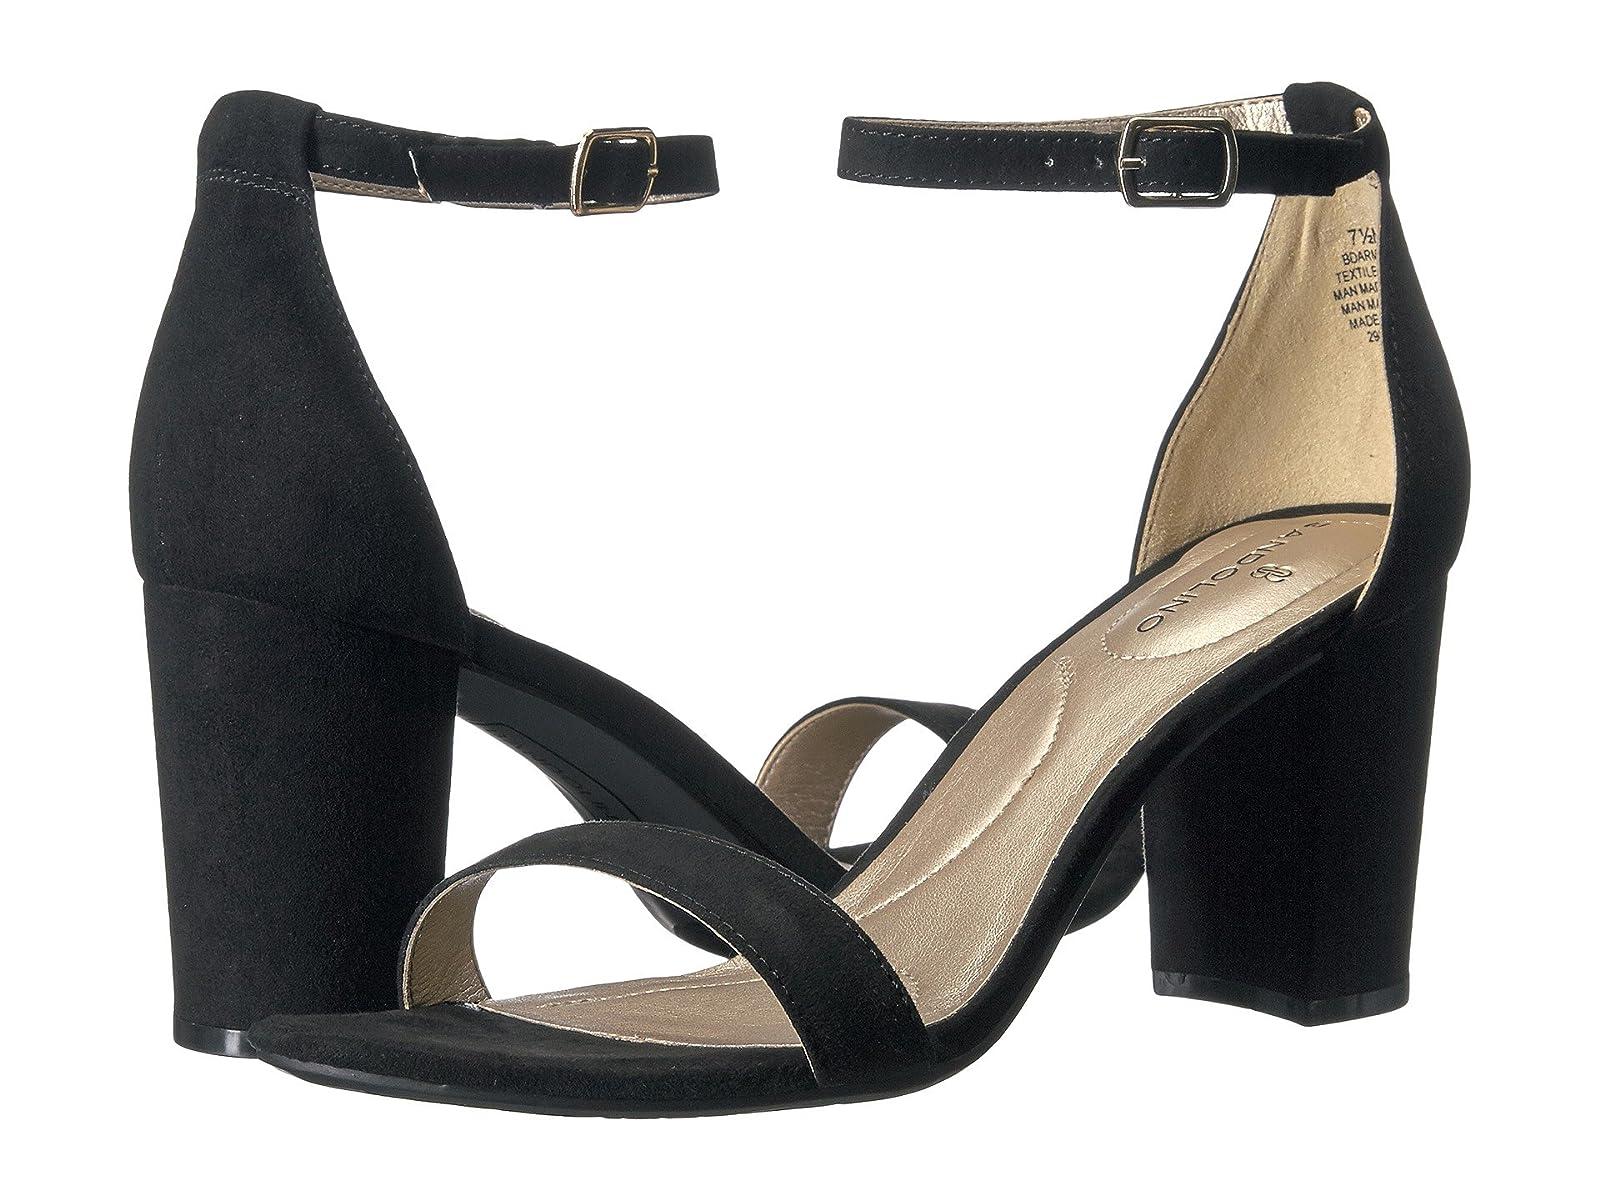 Bandolino ArmoryAtmospheric grades have affordable shoes